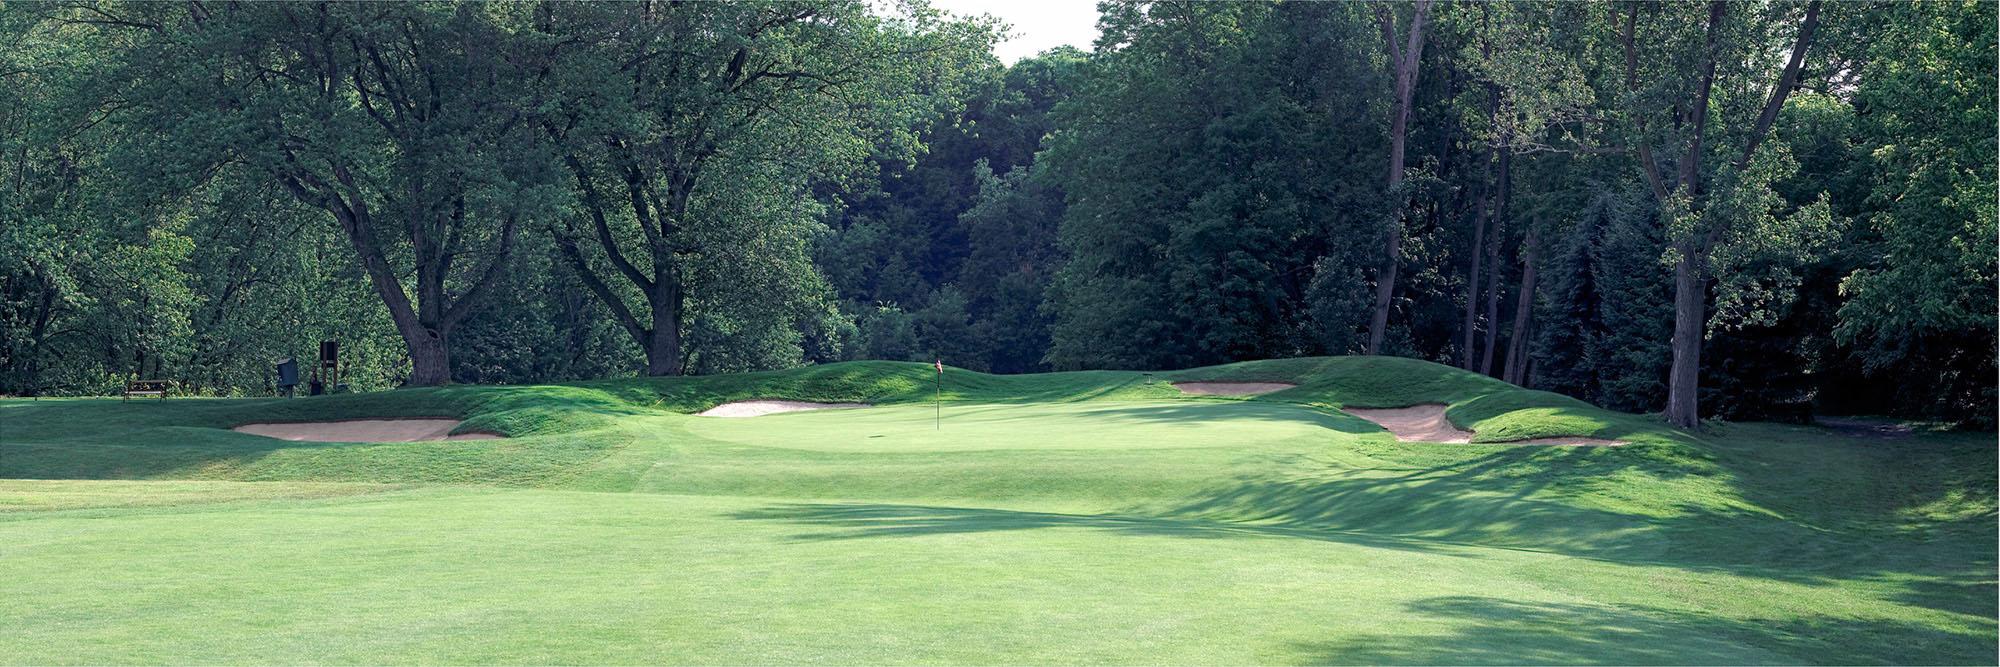 Golf Course Image - Lockport No. 5